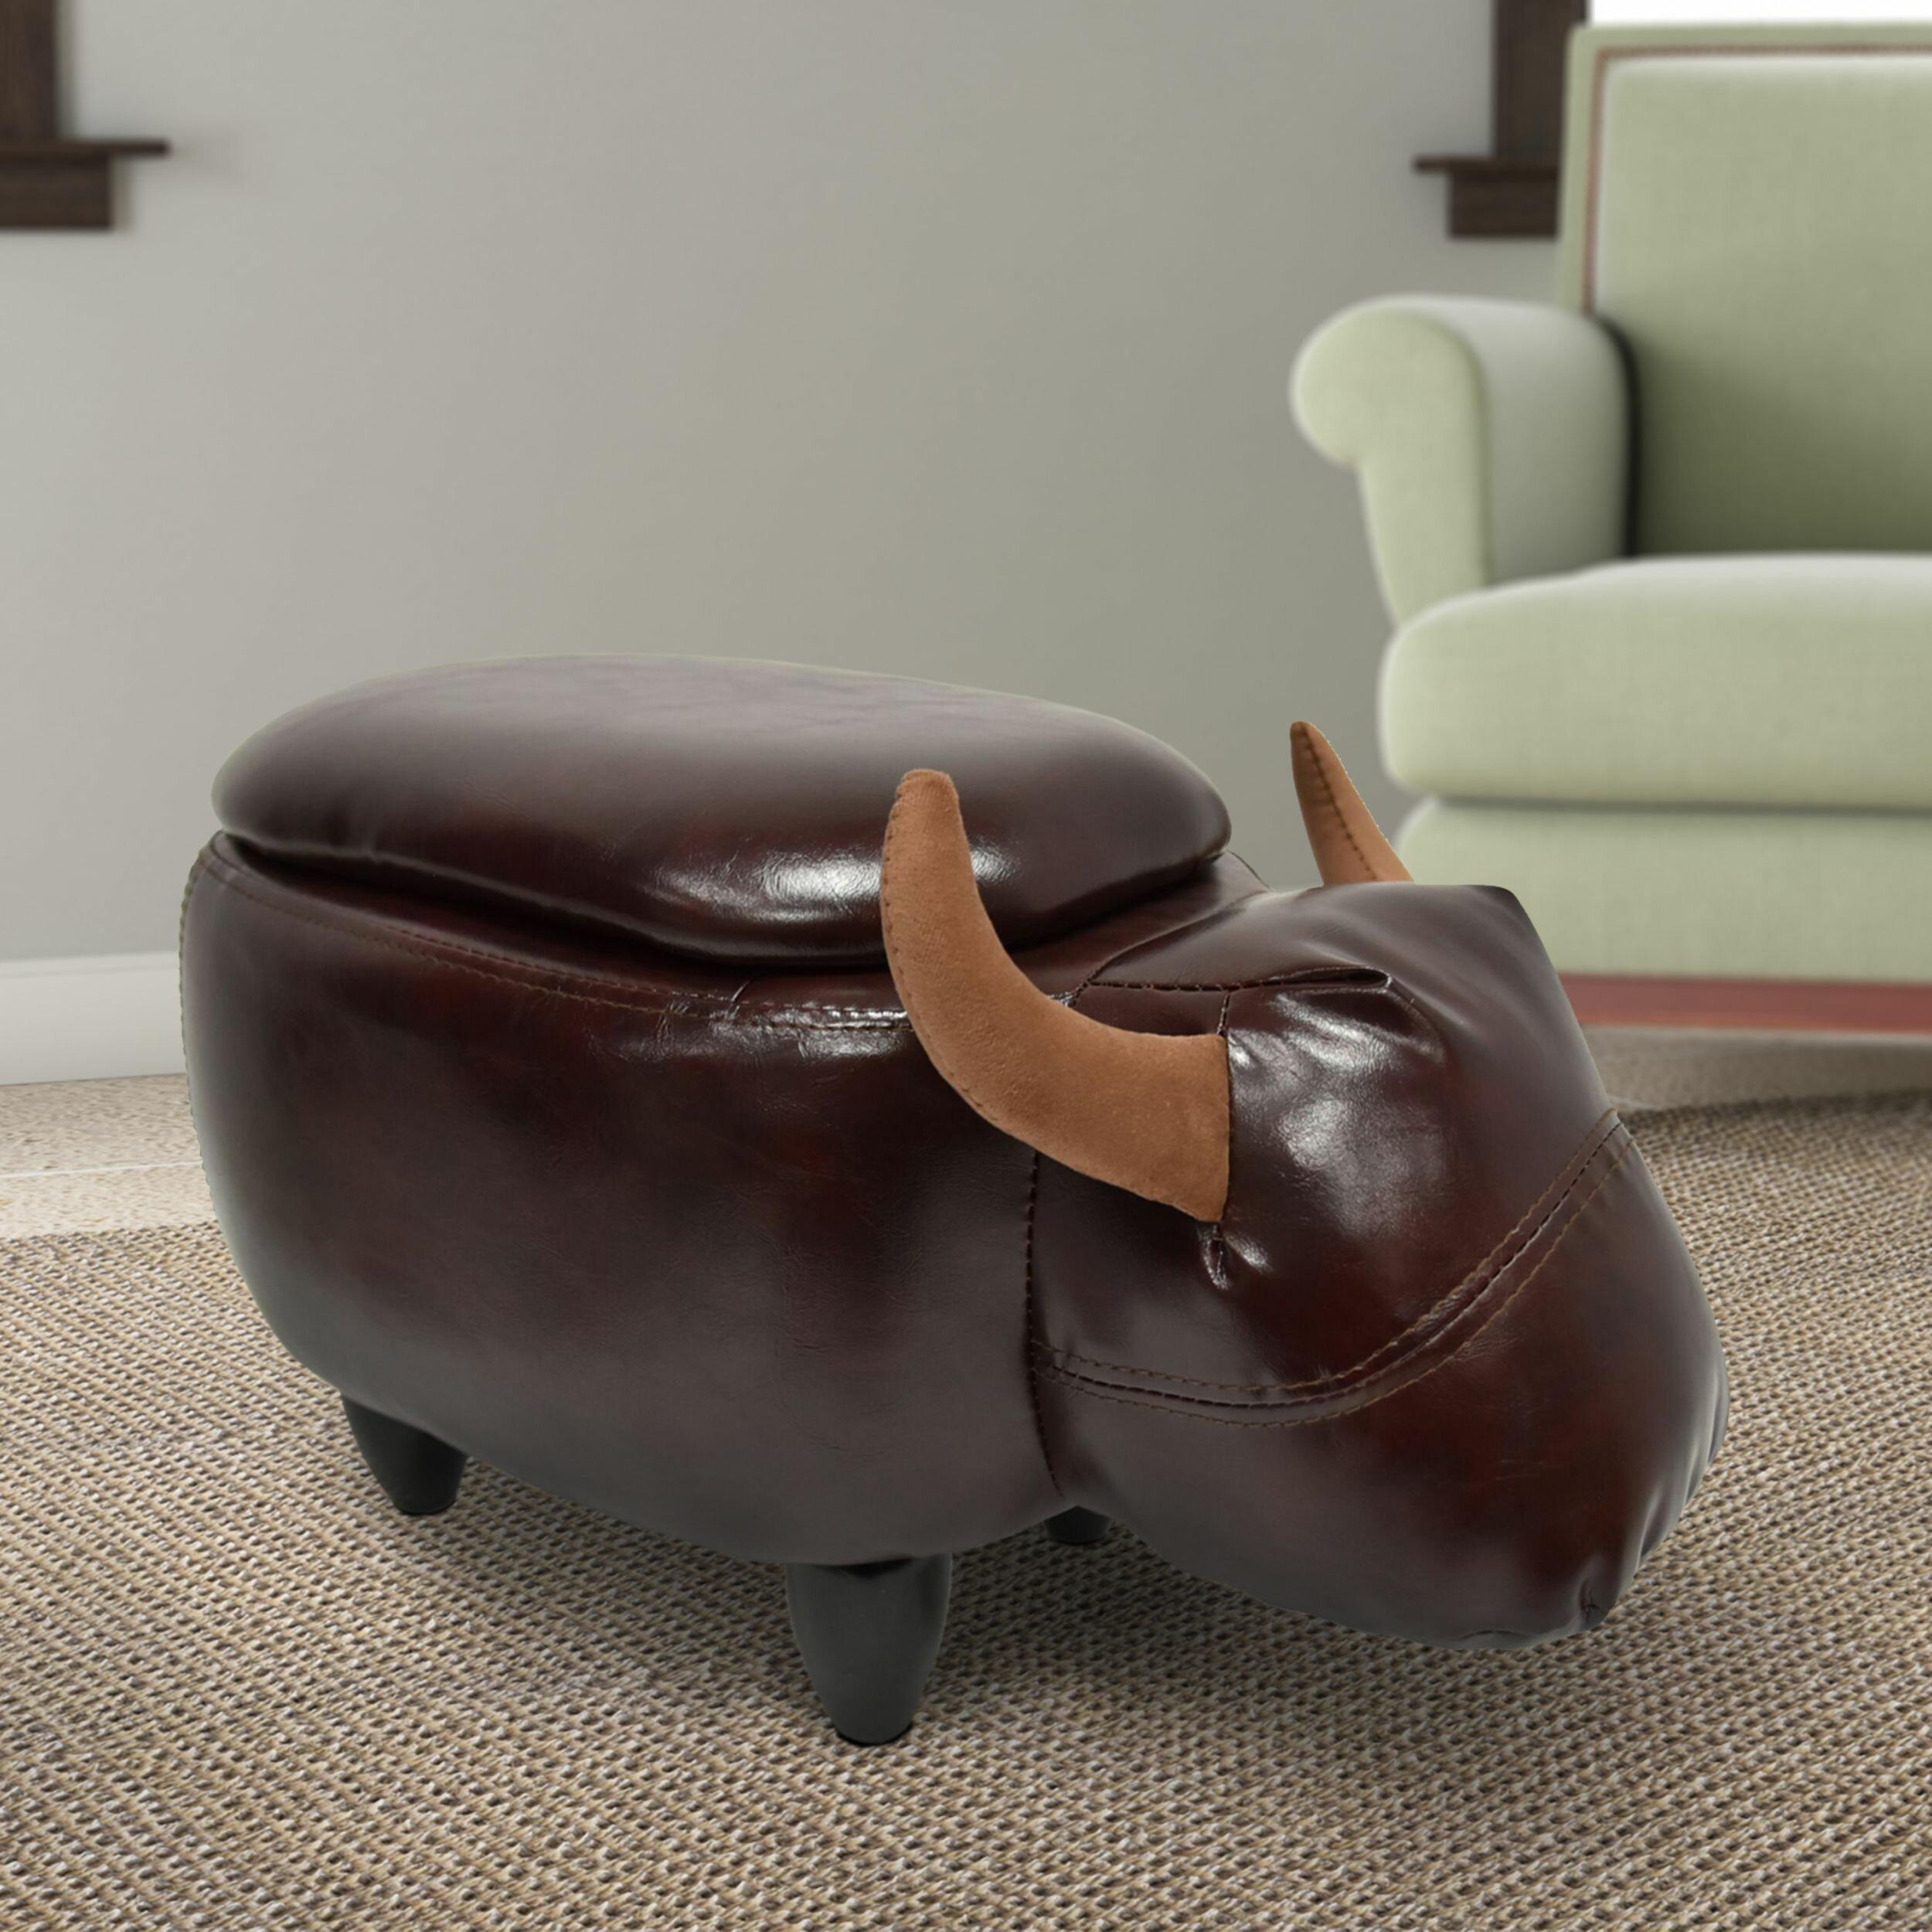 Peachy Whitmer Cow Shaped Storage Ottoman Theyellowbook Wood Chair Design Ideas Theyellowbookinfo